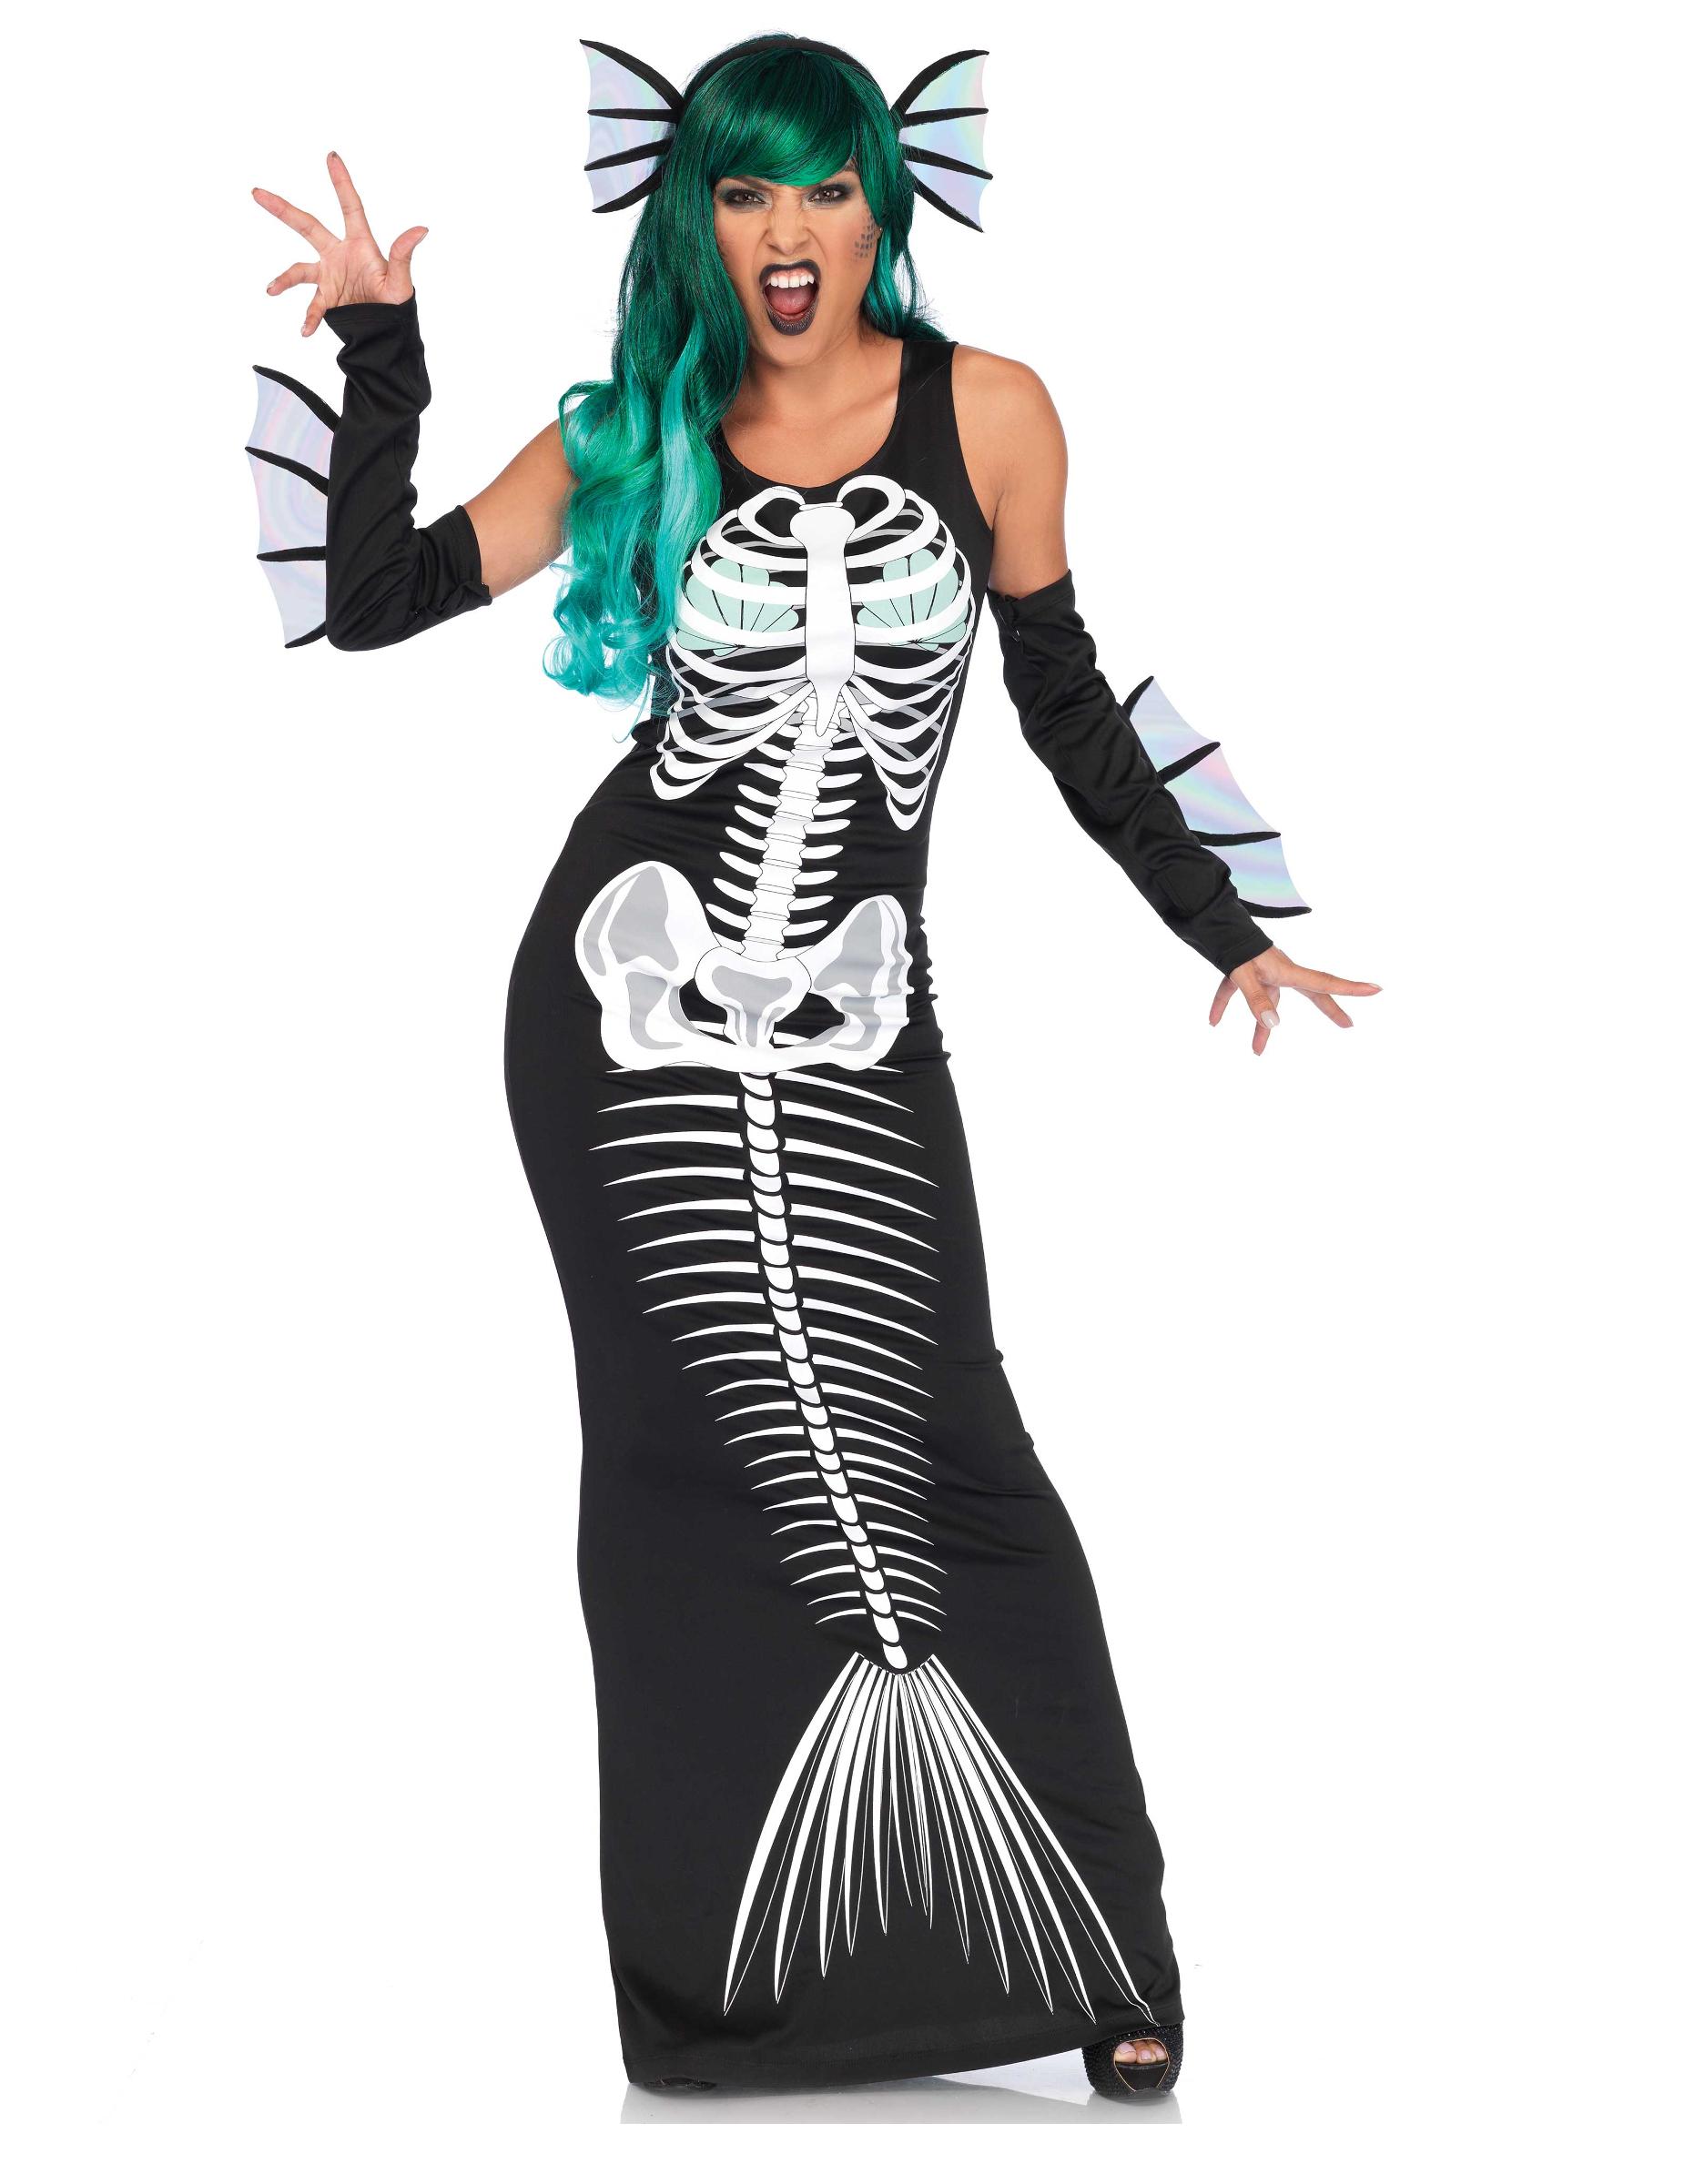 Costume Halloween scheletro da sirena  Costumi adulti b5d70c729006